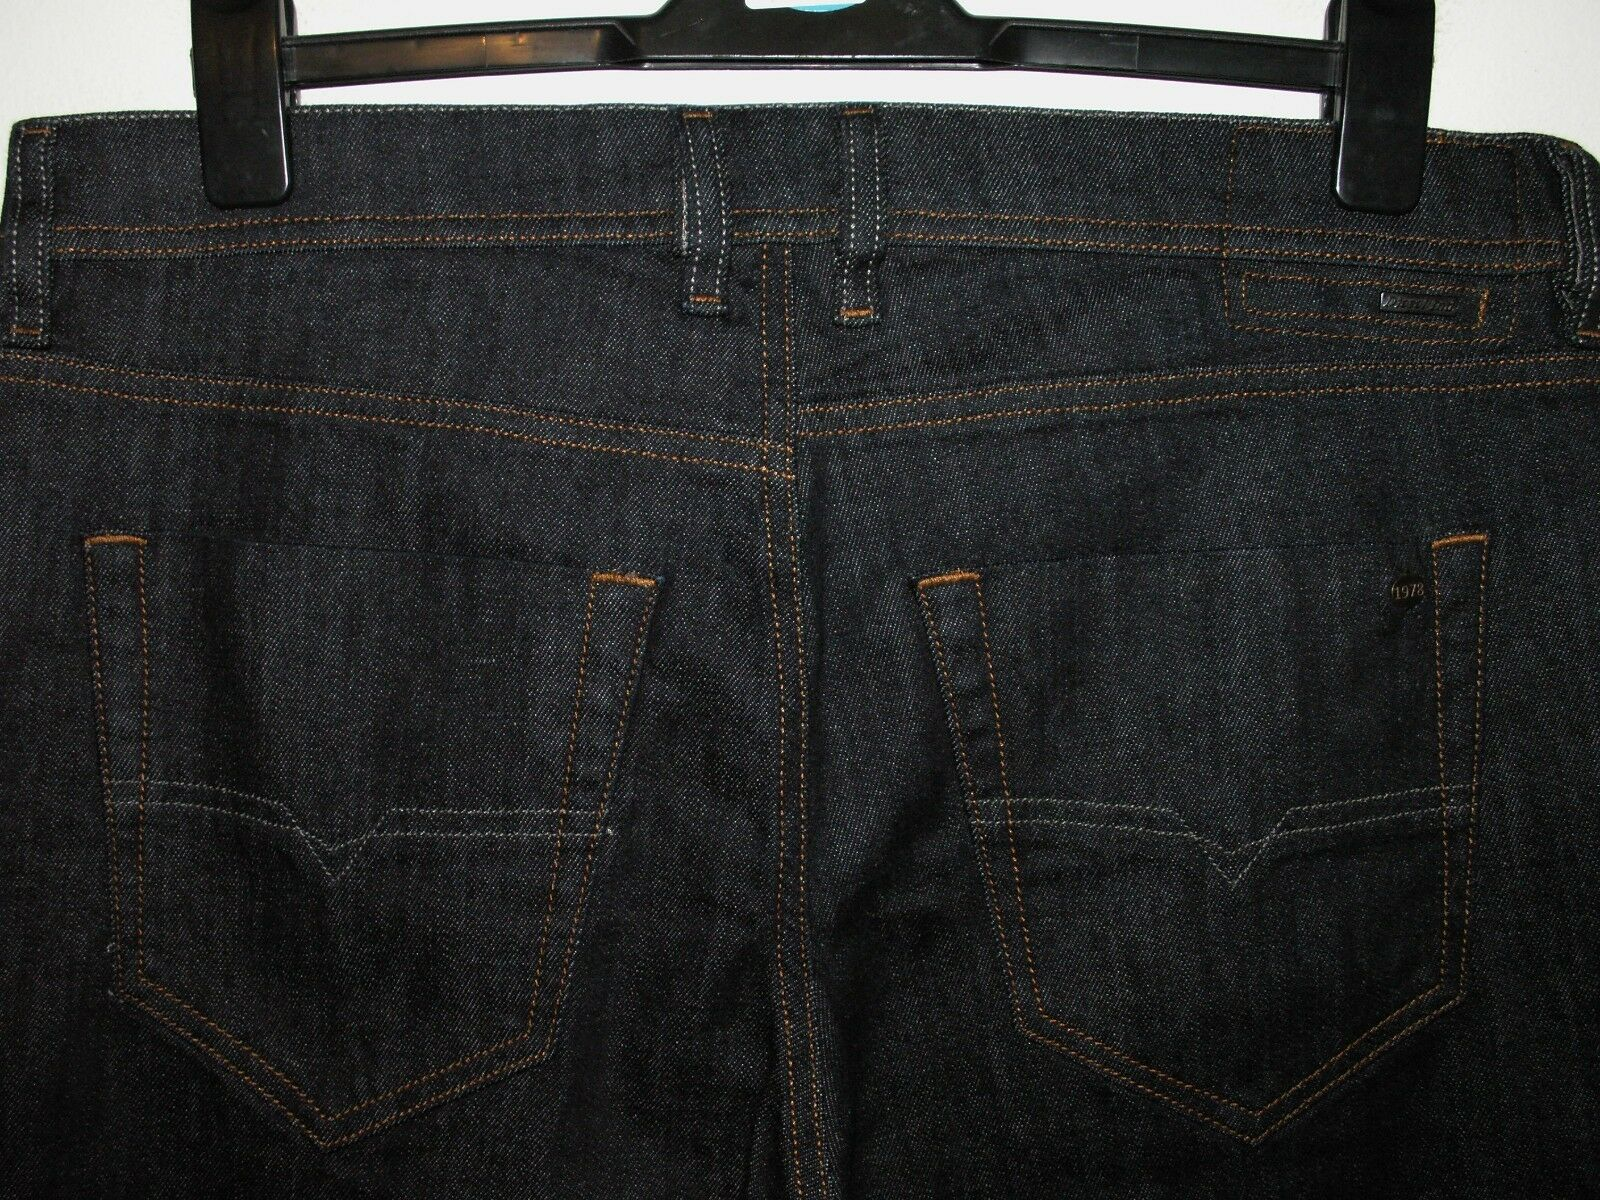 DIESEL TEPPHAR SLIM-CARred JEANS 0604B STRETCH W34 L32 5334 .99 sale .99